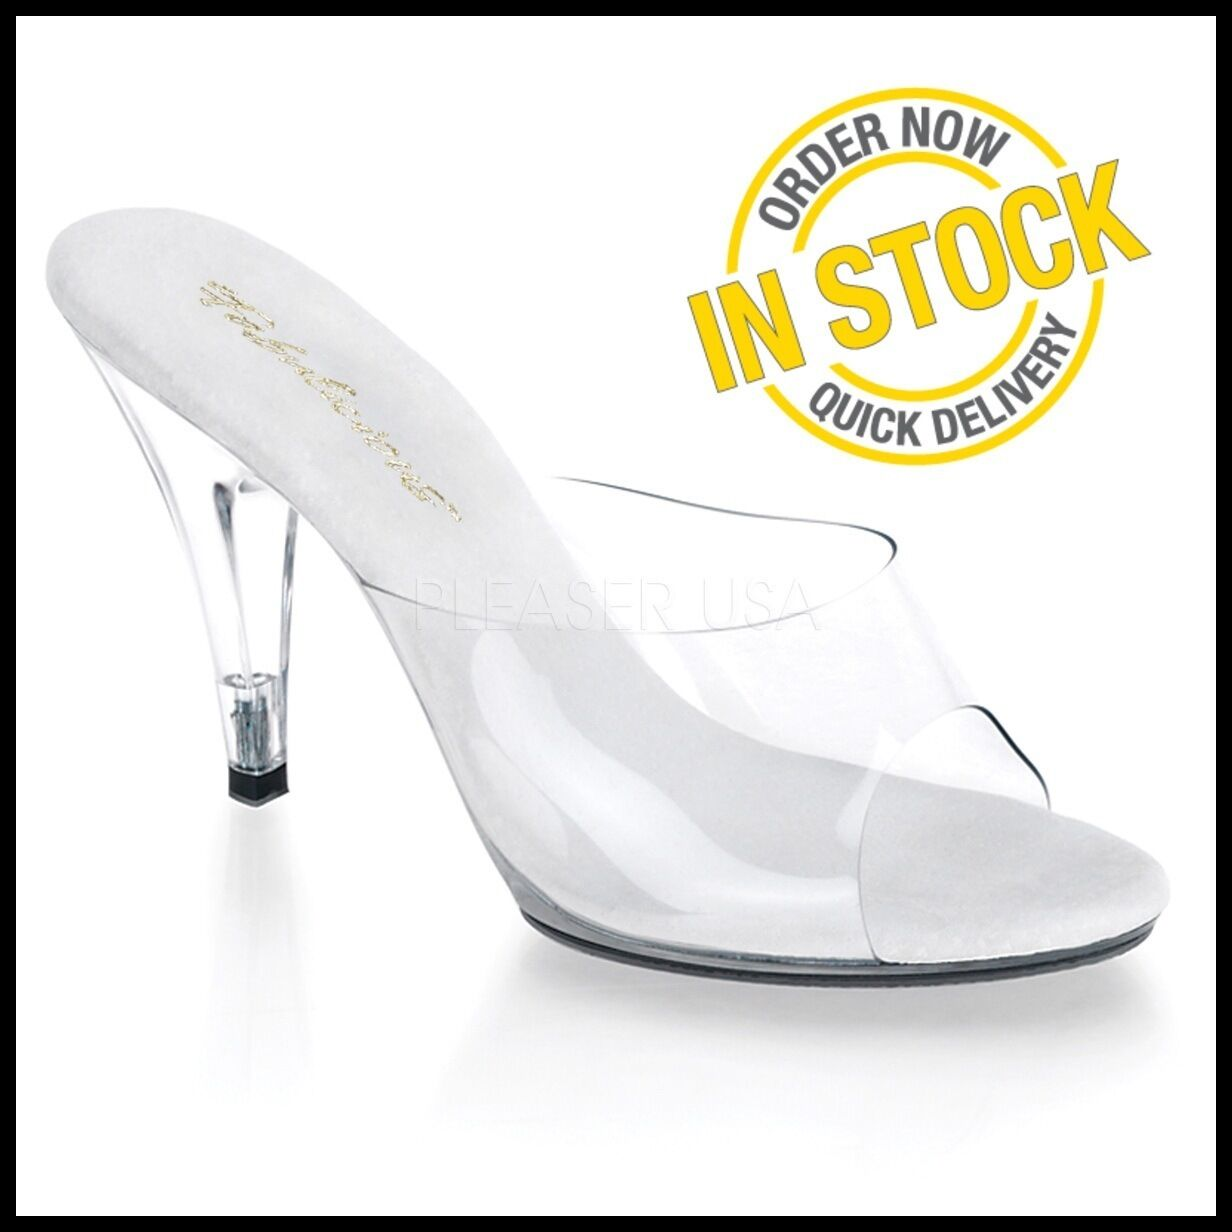 Caress-401 Nuevo Posando Comp Zapatos Transparente Tacones Bikini competencia Sandalias 4 Pulgadas